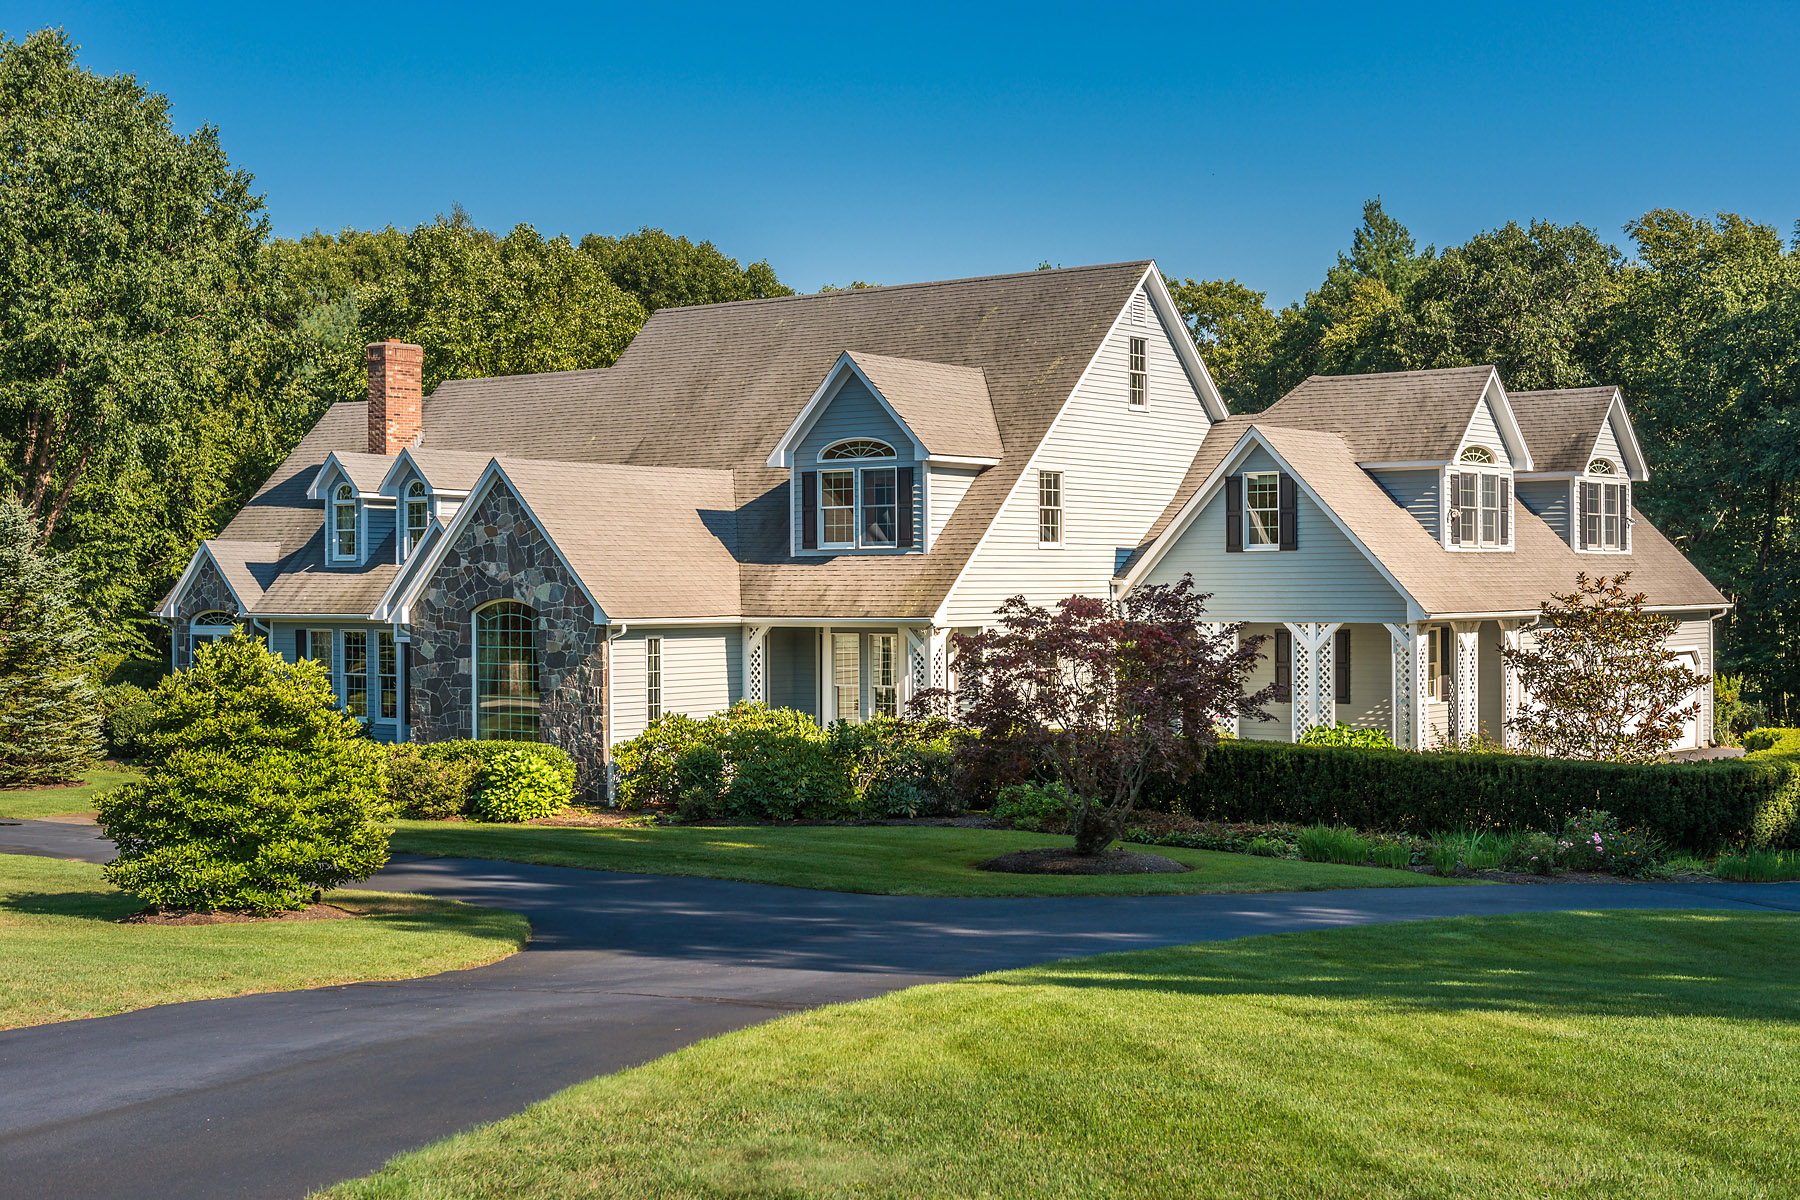 Villa per Vendita alle ore 38 Miss Fry Drive East Greenwich, Rhode Island 02818 Stati Uniti